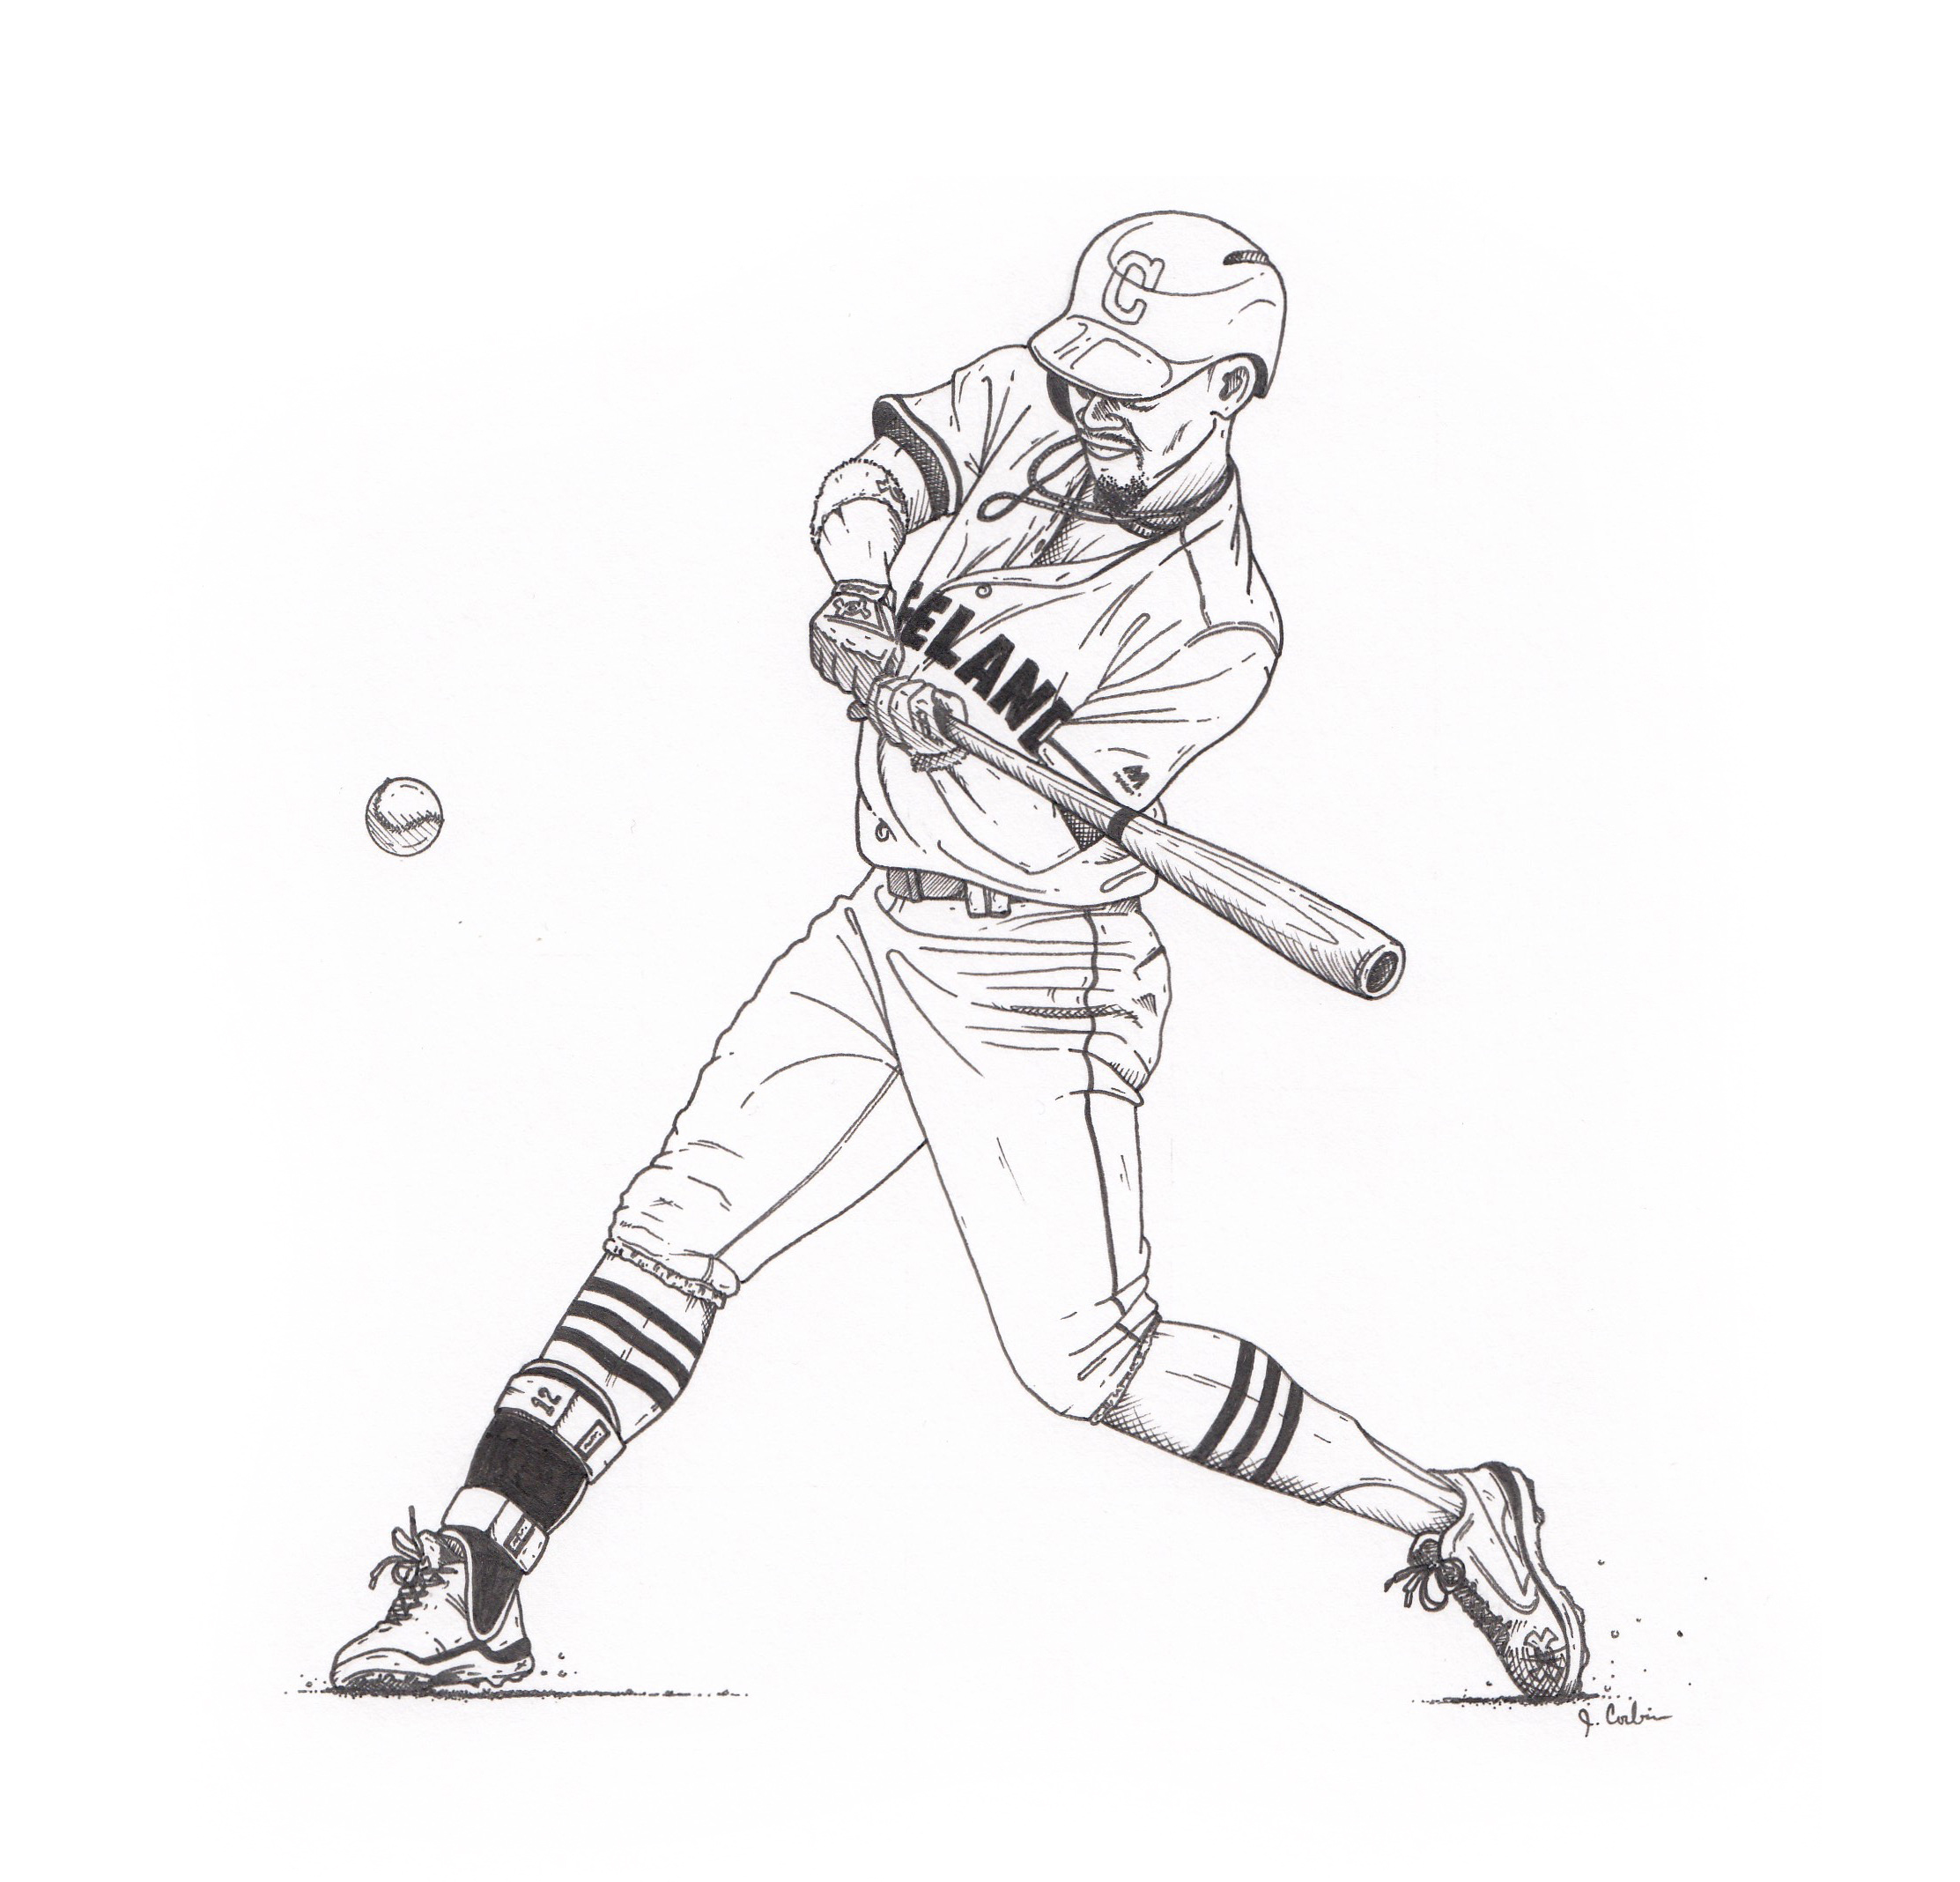 Black & White illustration of Cleveland Indians Shortstop Francisco Lindor